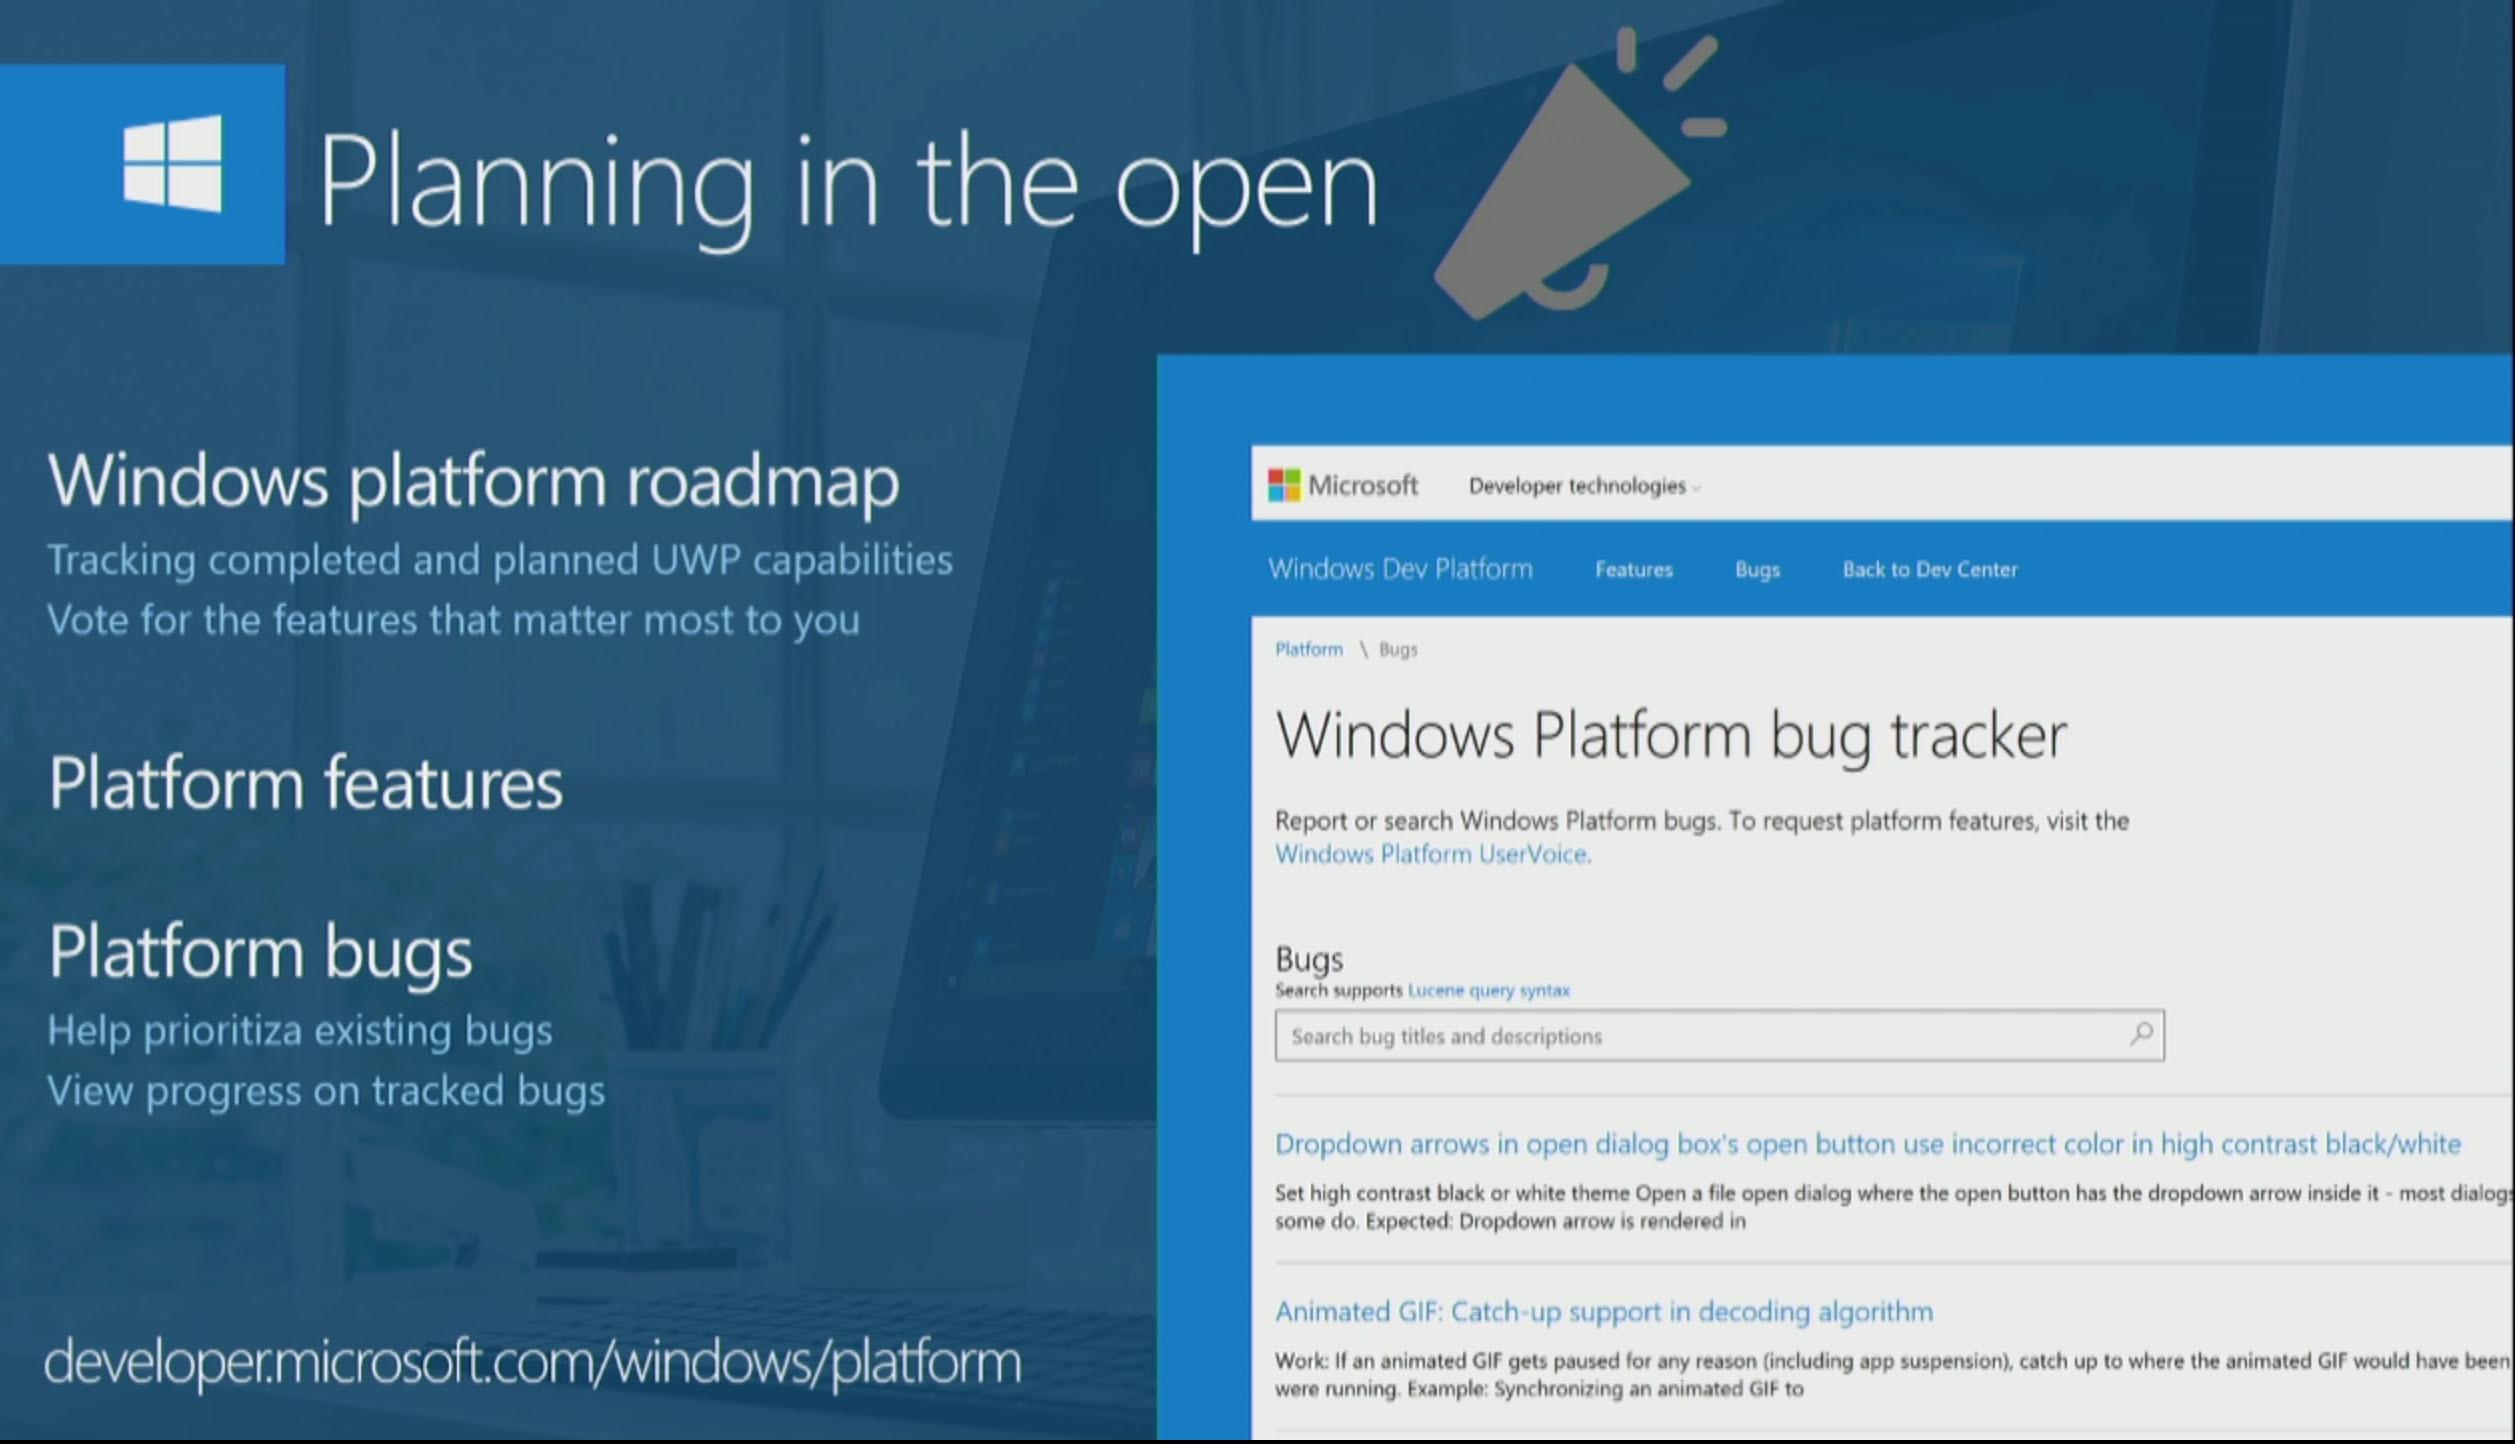 microsoft announces windows platform bug tracker with uwp roadmap